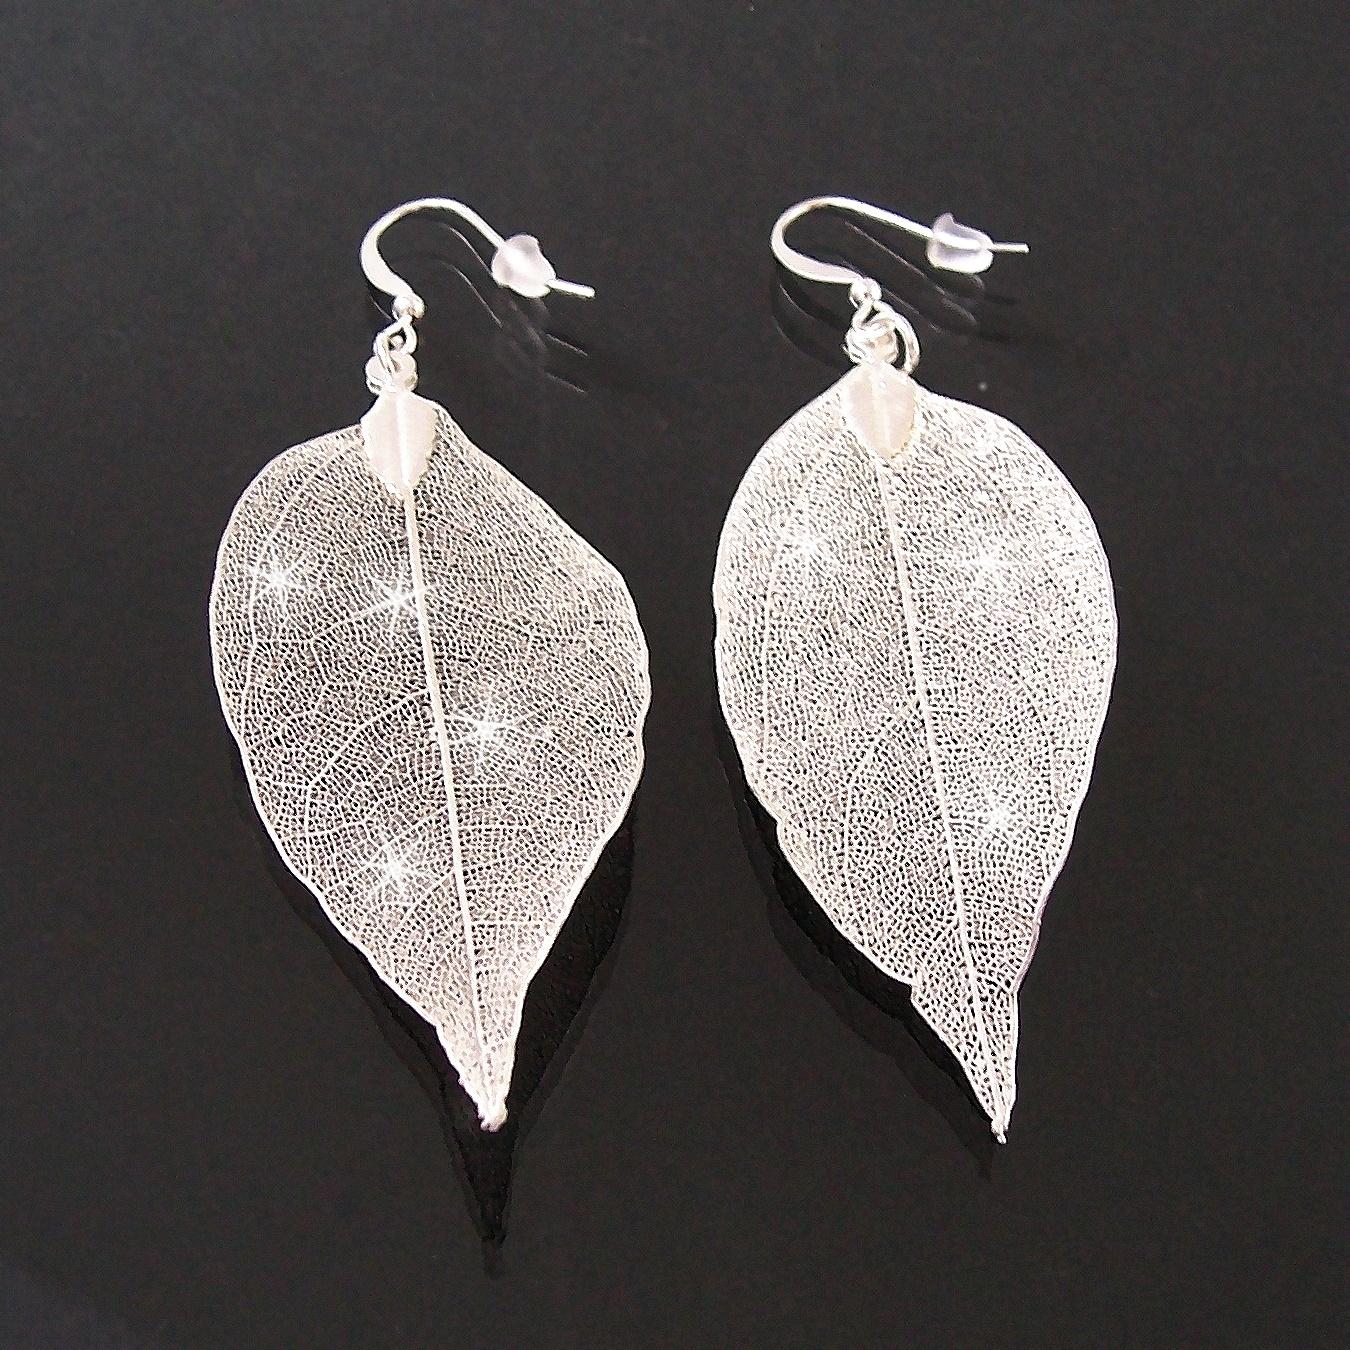 Ohrringe Anhänger Blatt glitzerfrosted Silber Blattohrringe 4cm O77751